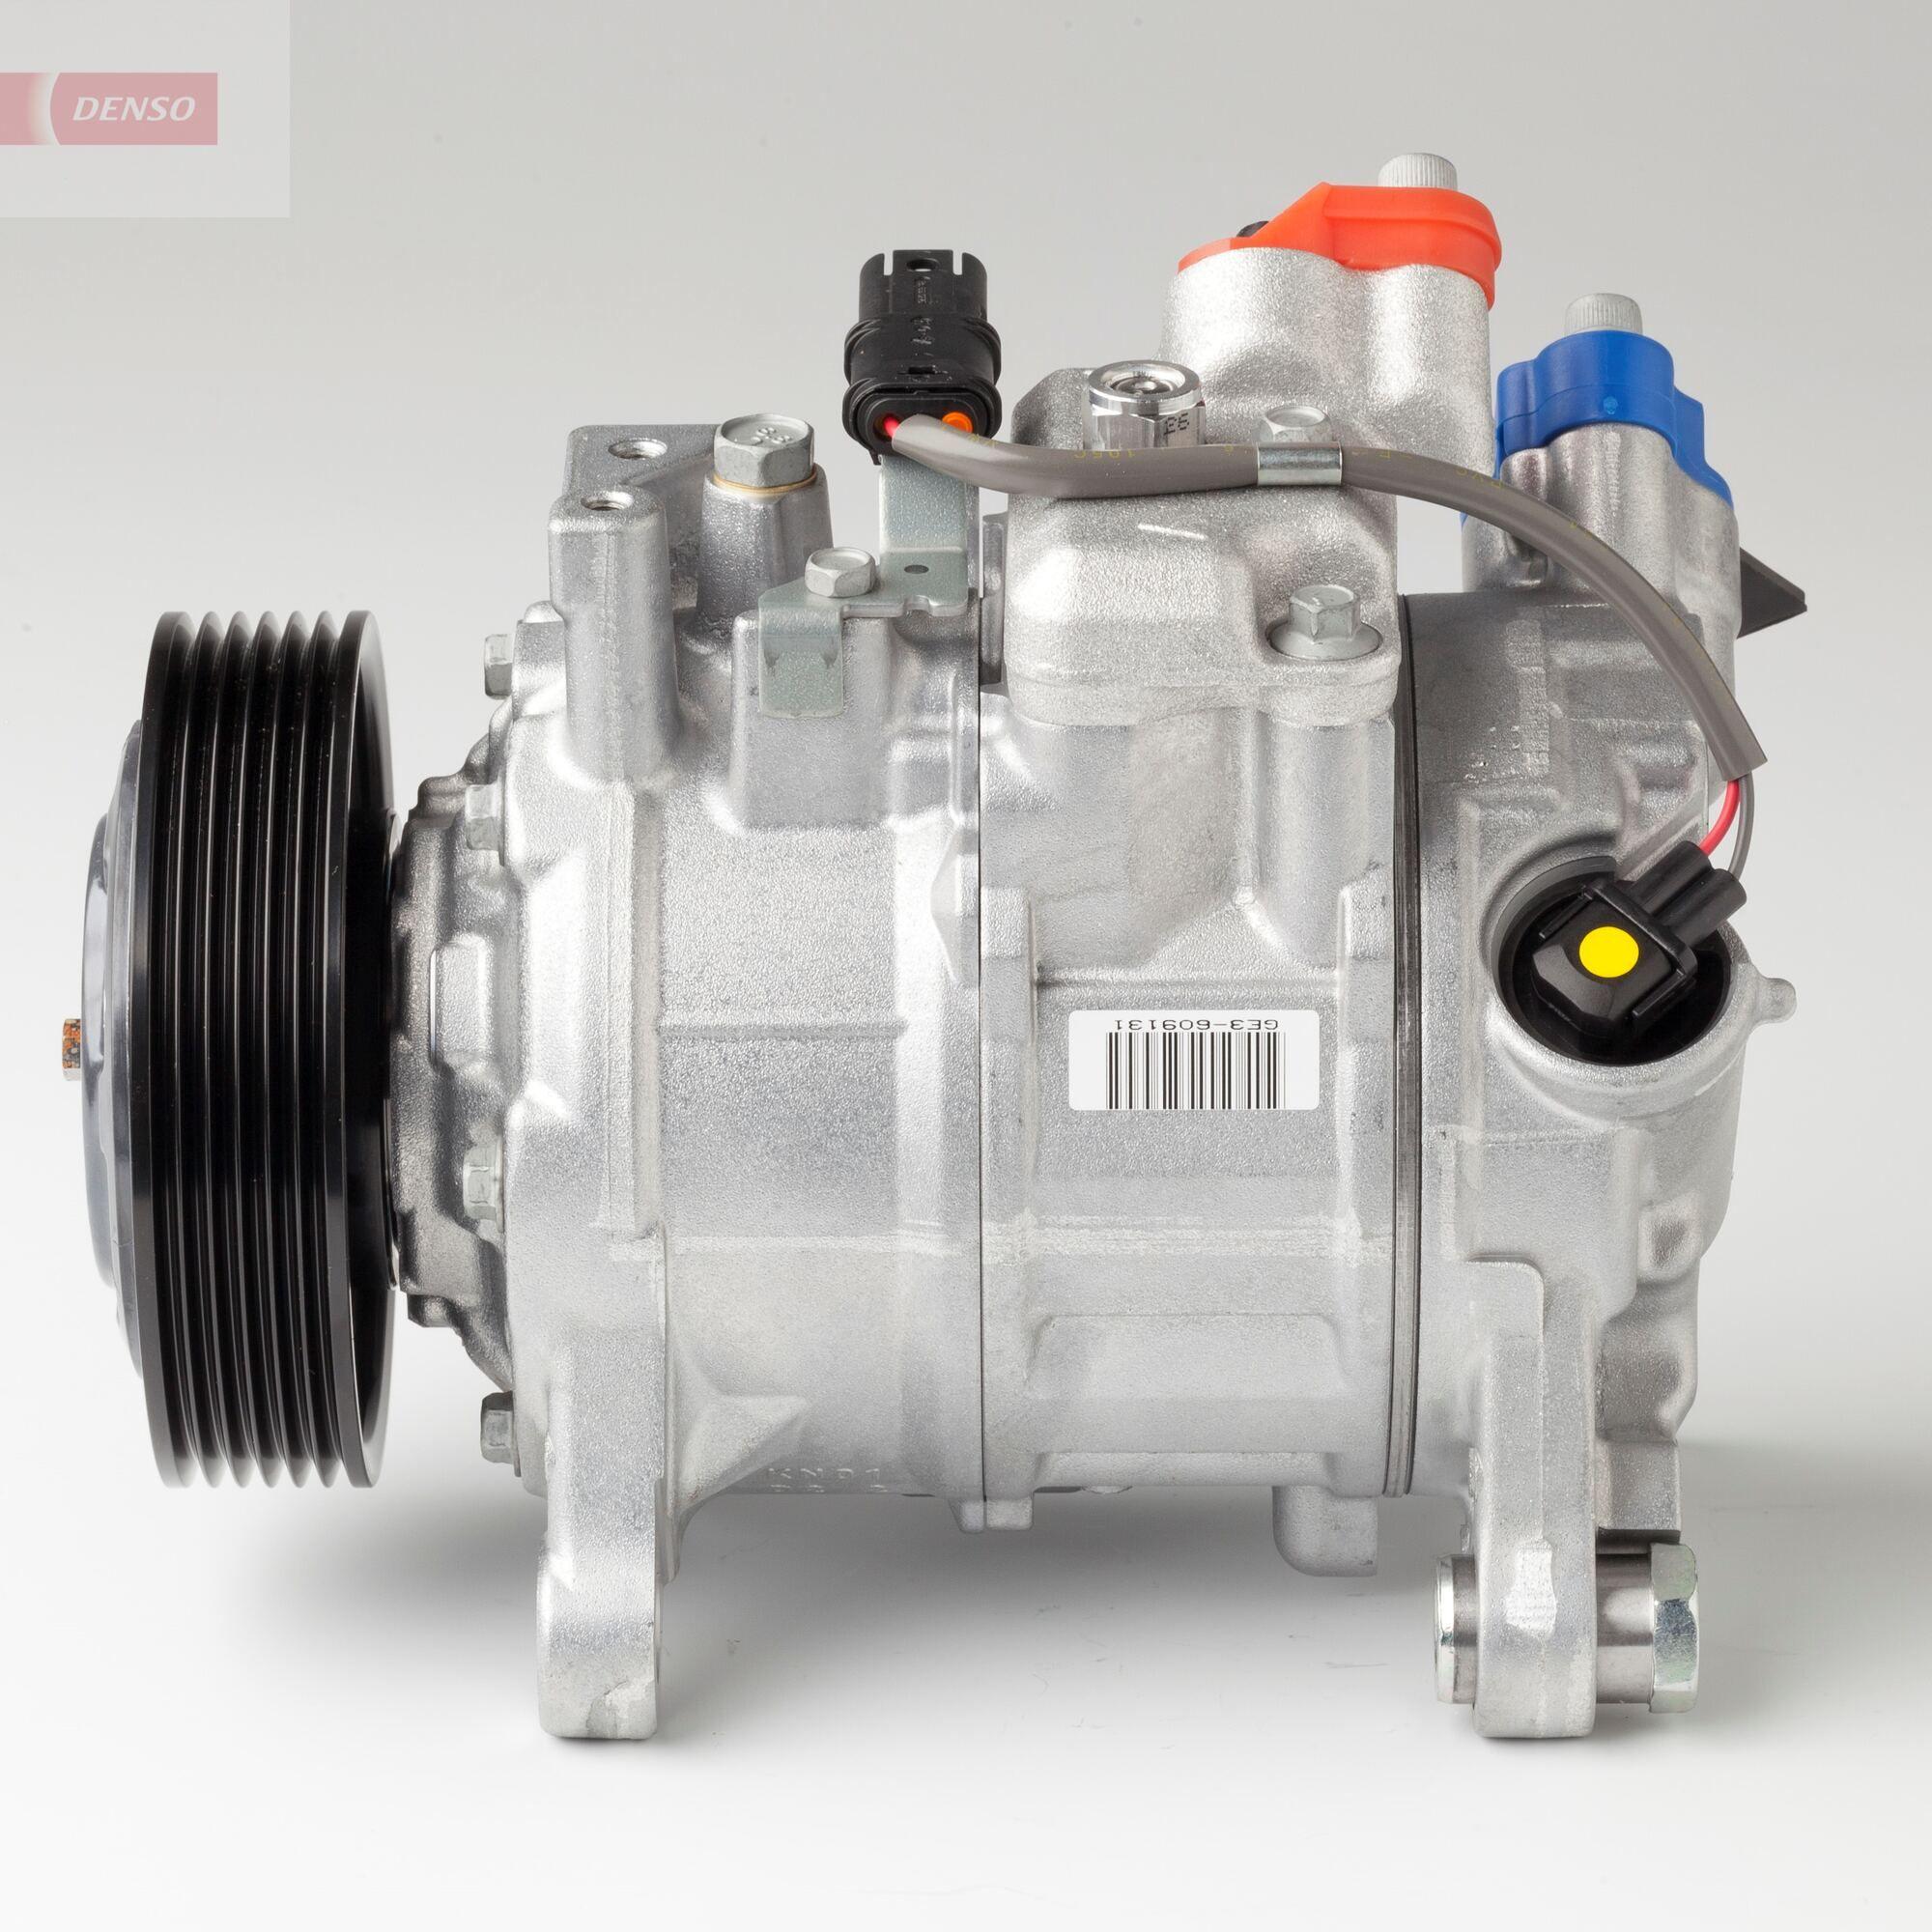 Kompressor Klimaanlage DENSO DCP05091